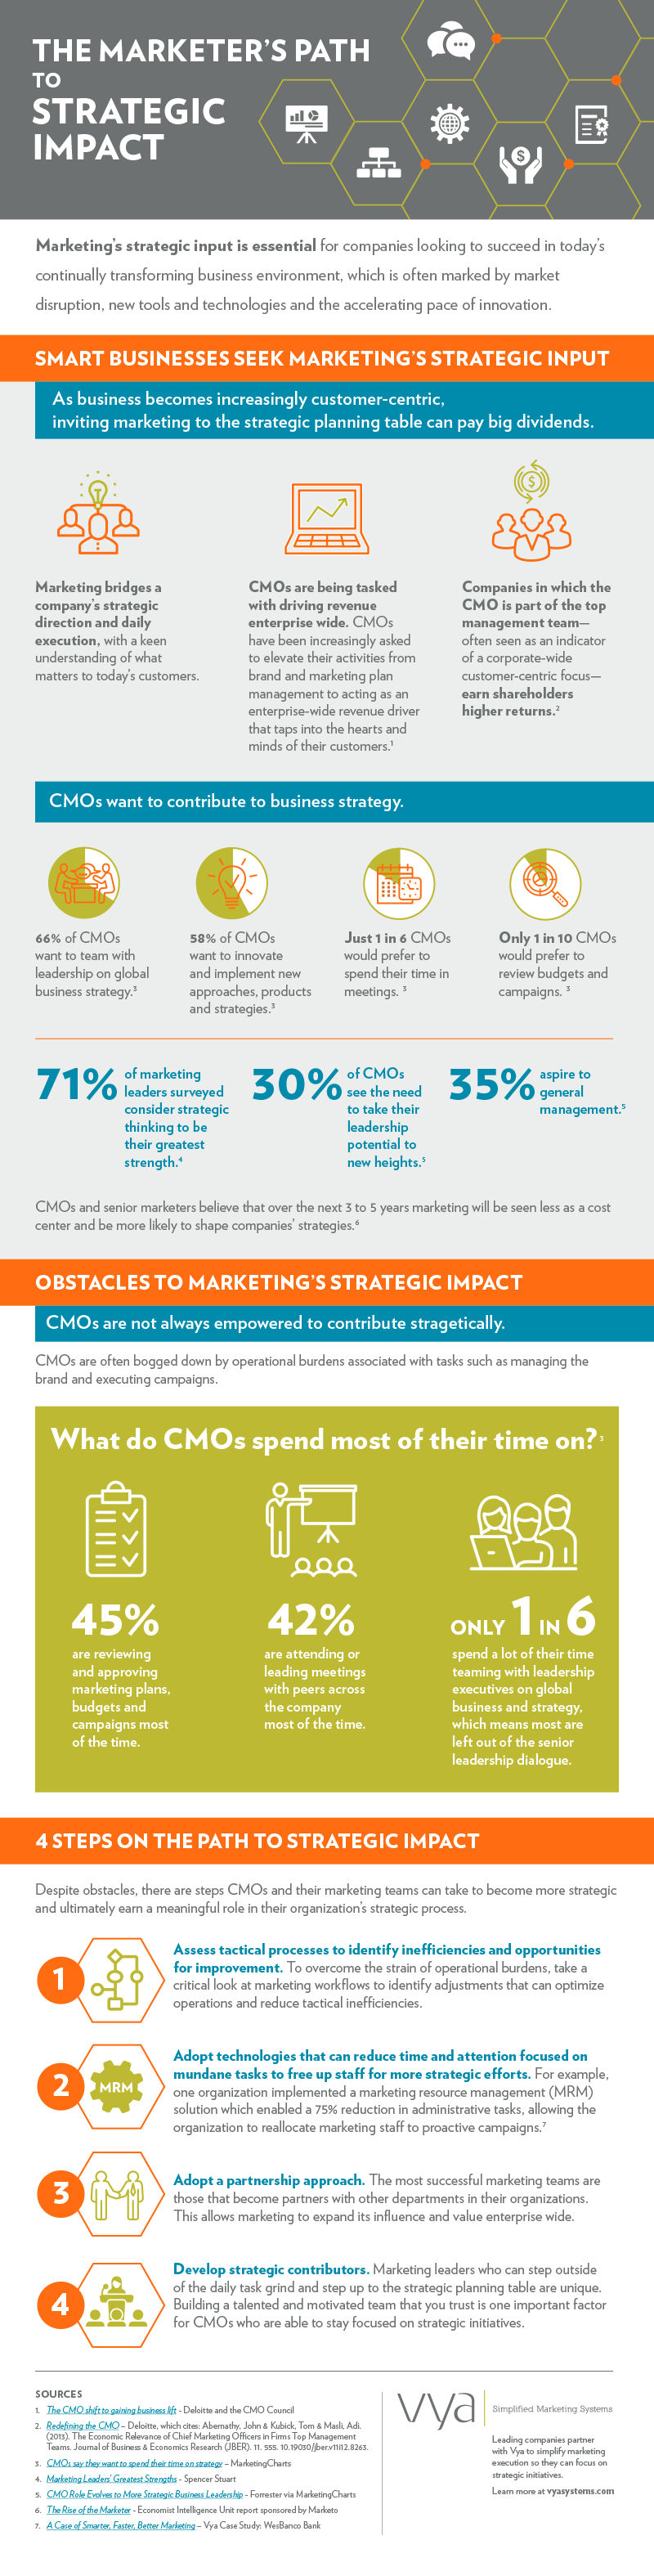 Infographic: Marketers' Strategic Impact